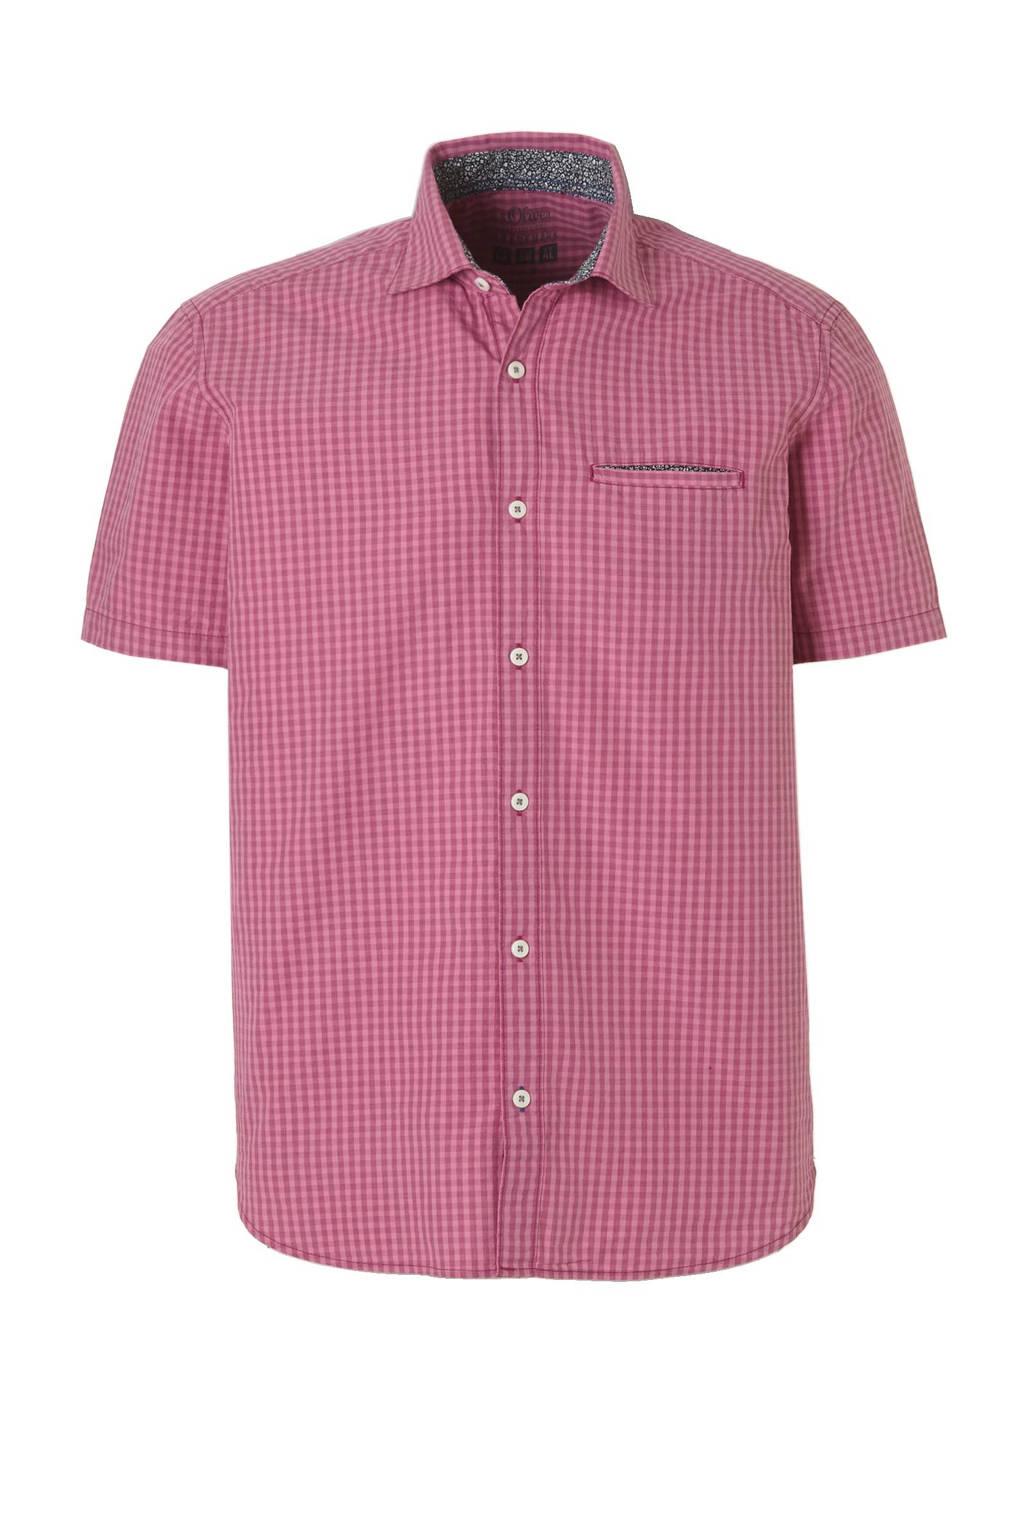 Roze Overhemd.S Oliver Geruit Overhemd Roze Wehkamp